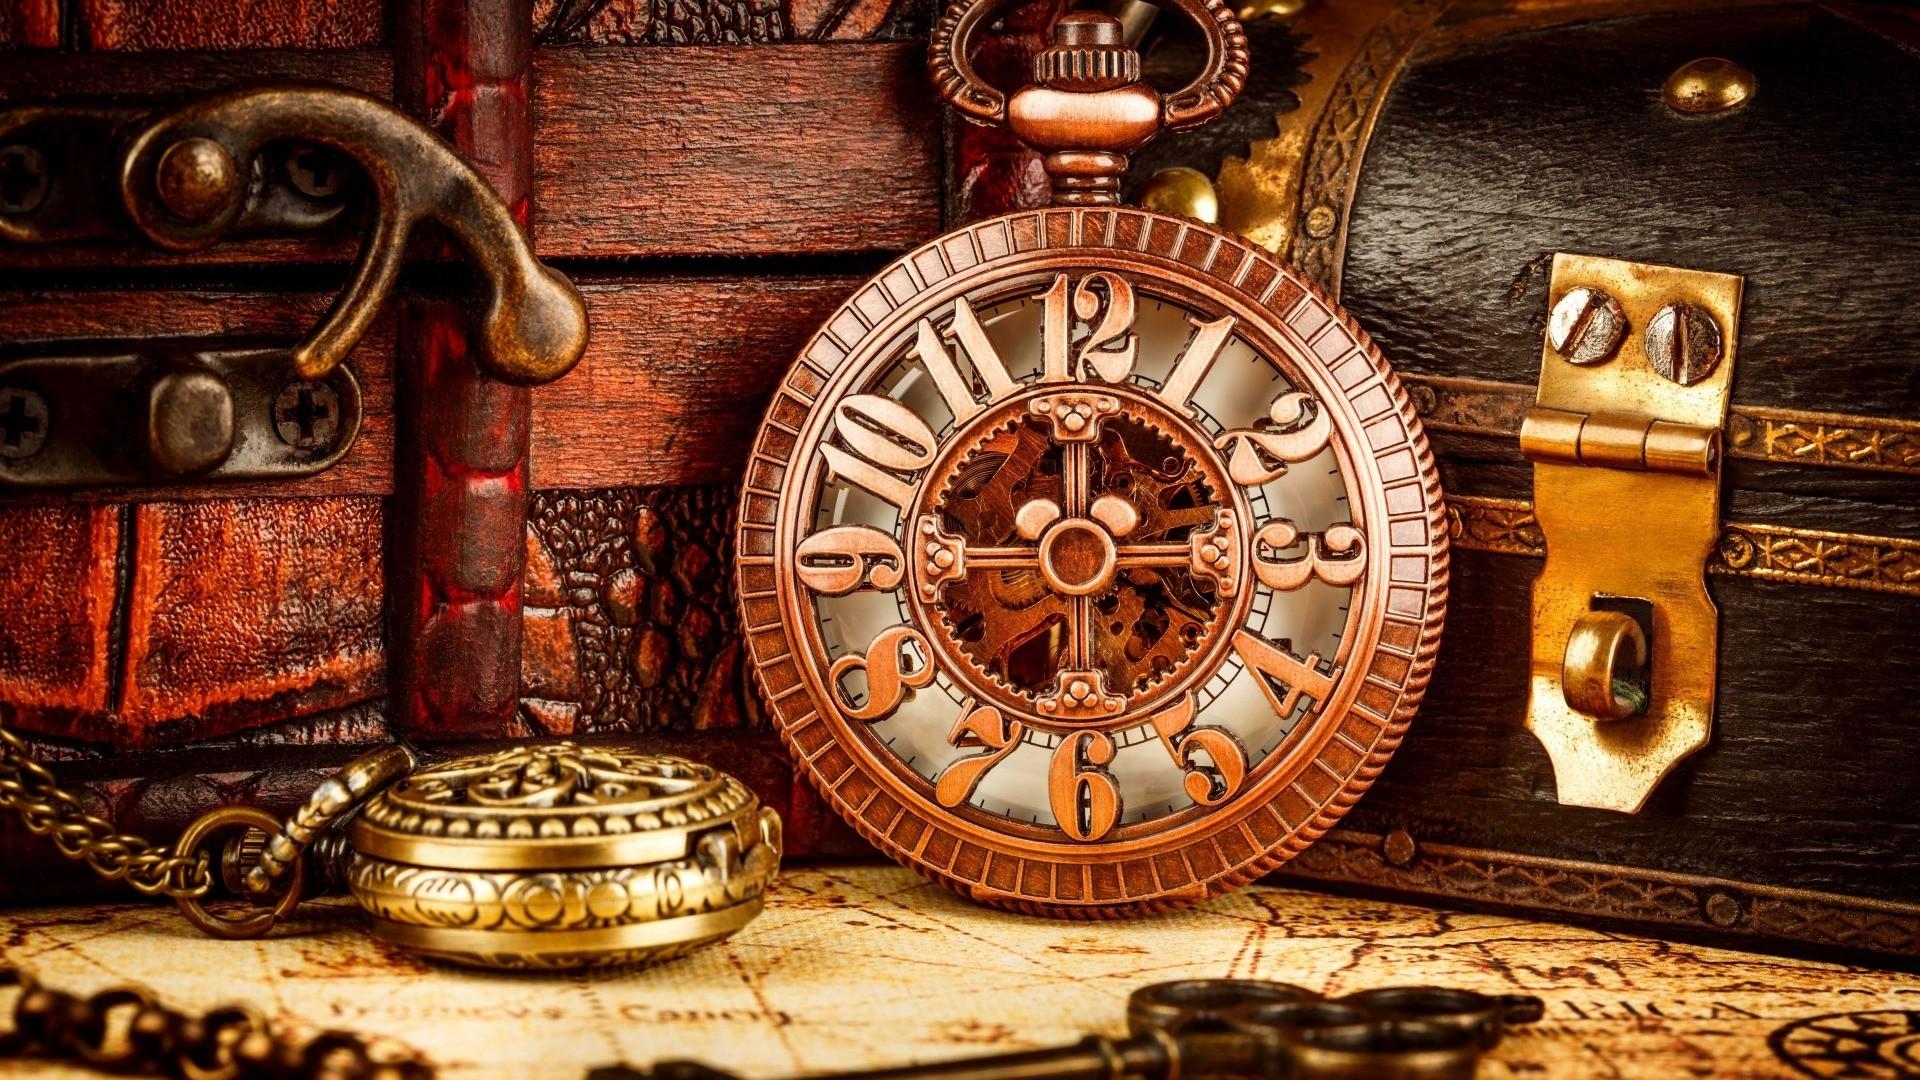 Clock Wallpaper image hd